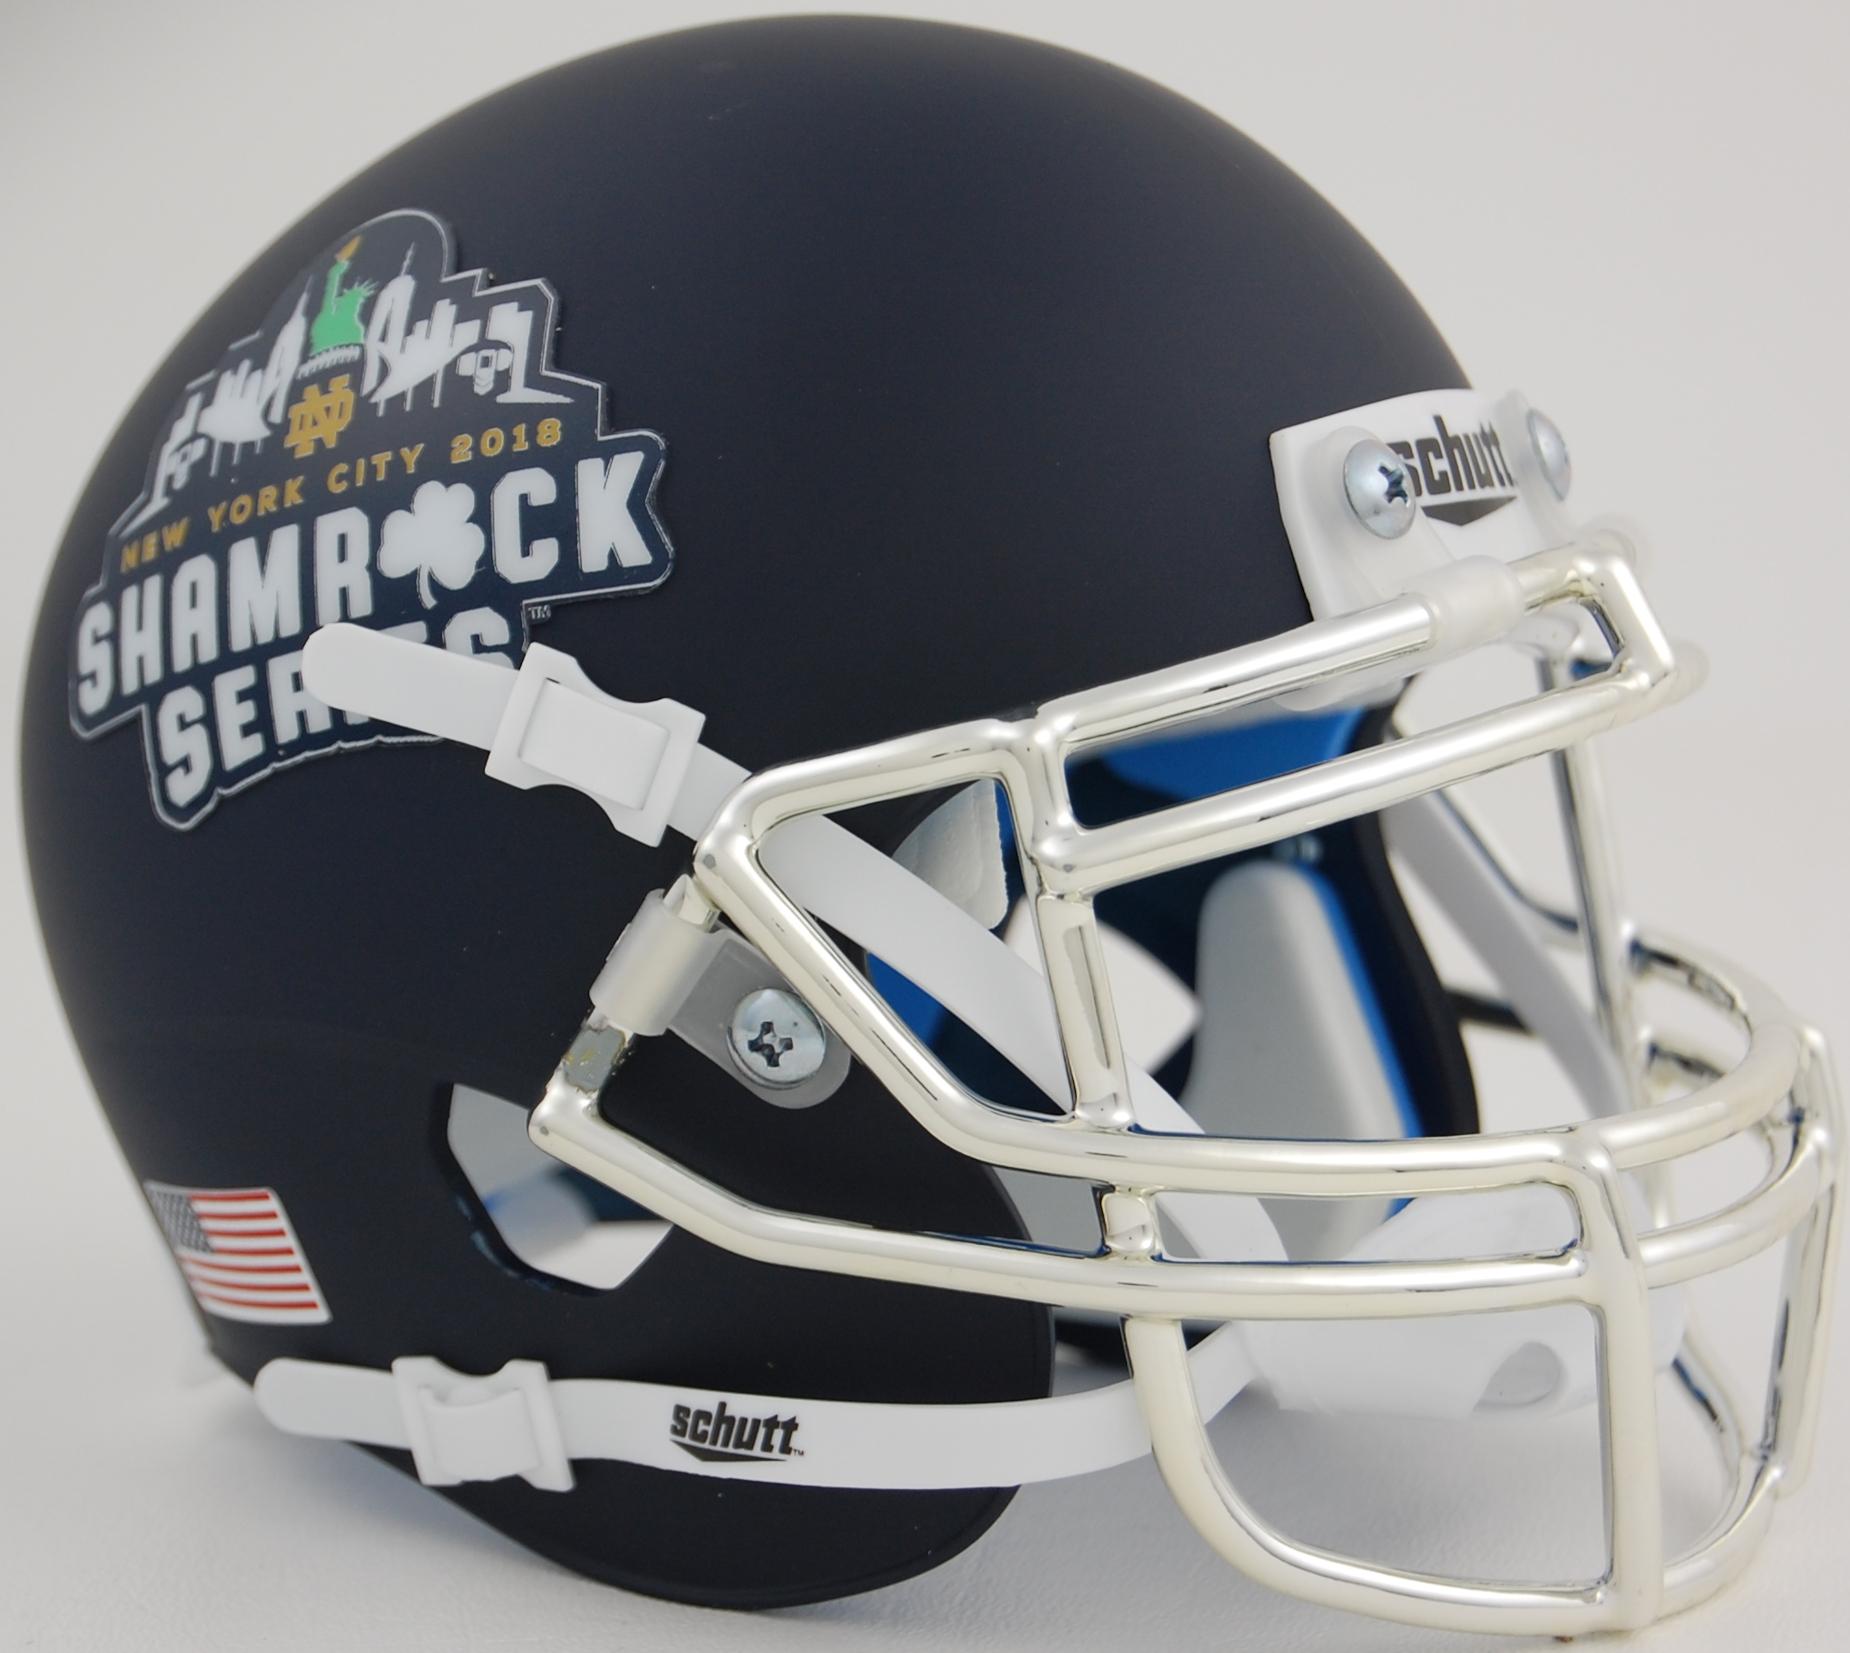 Notre Dame Fighting Irish Full XP Replica Football Helmet Schutt <B>Shamrock Series</B>